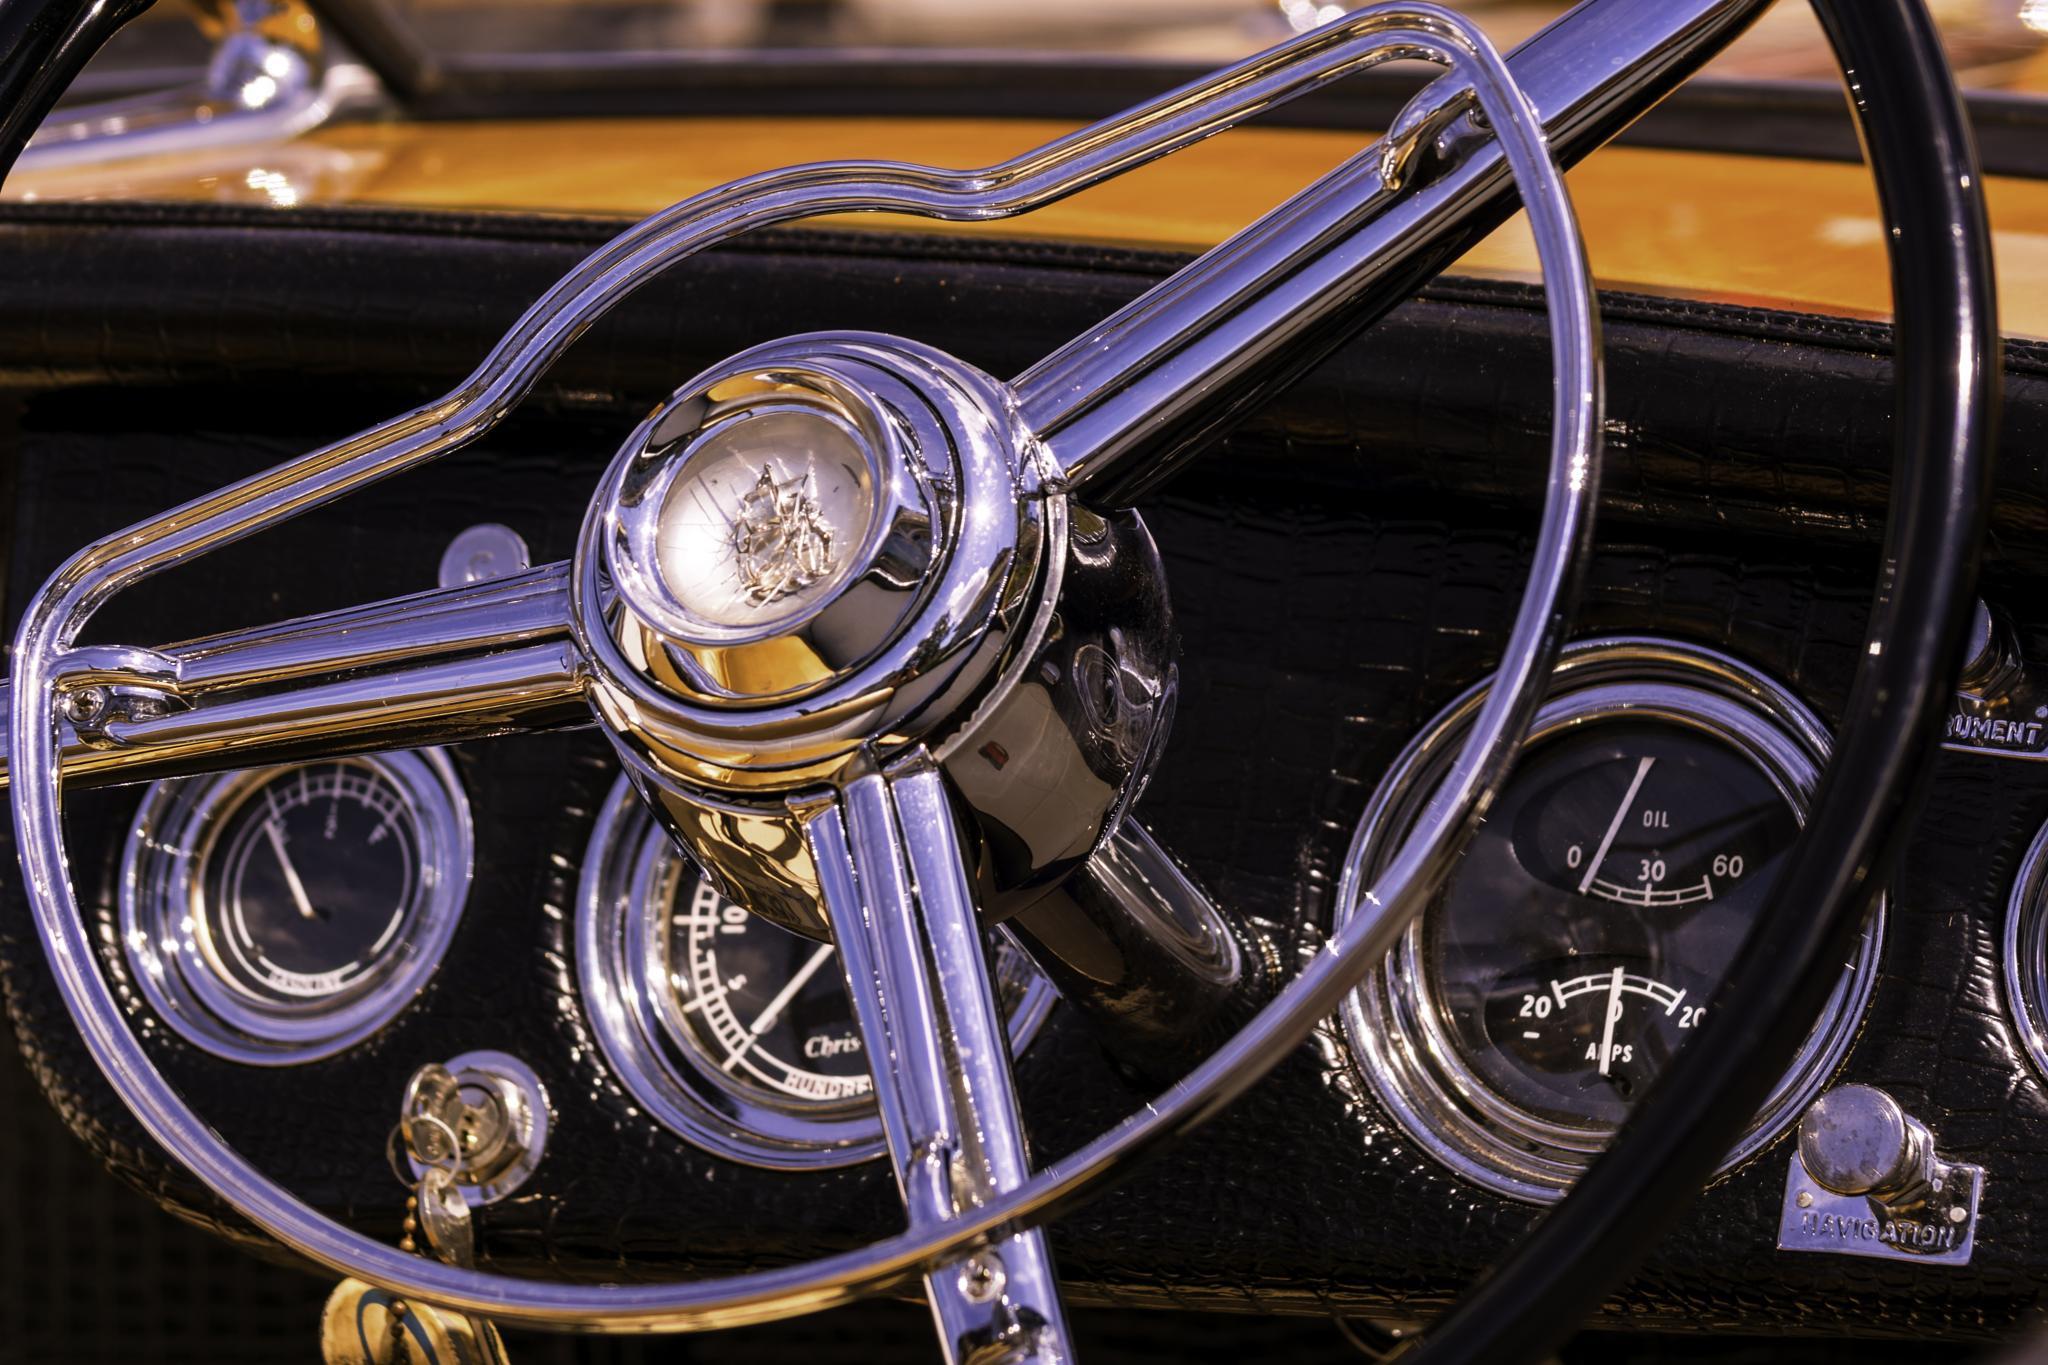 Chromed Cruiser by JoeGeraci